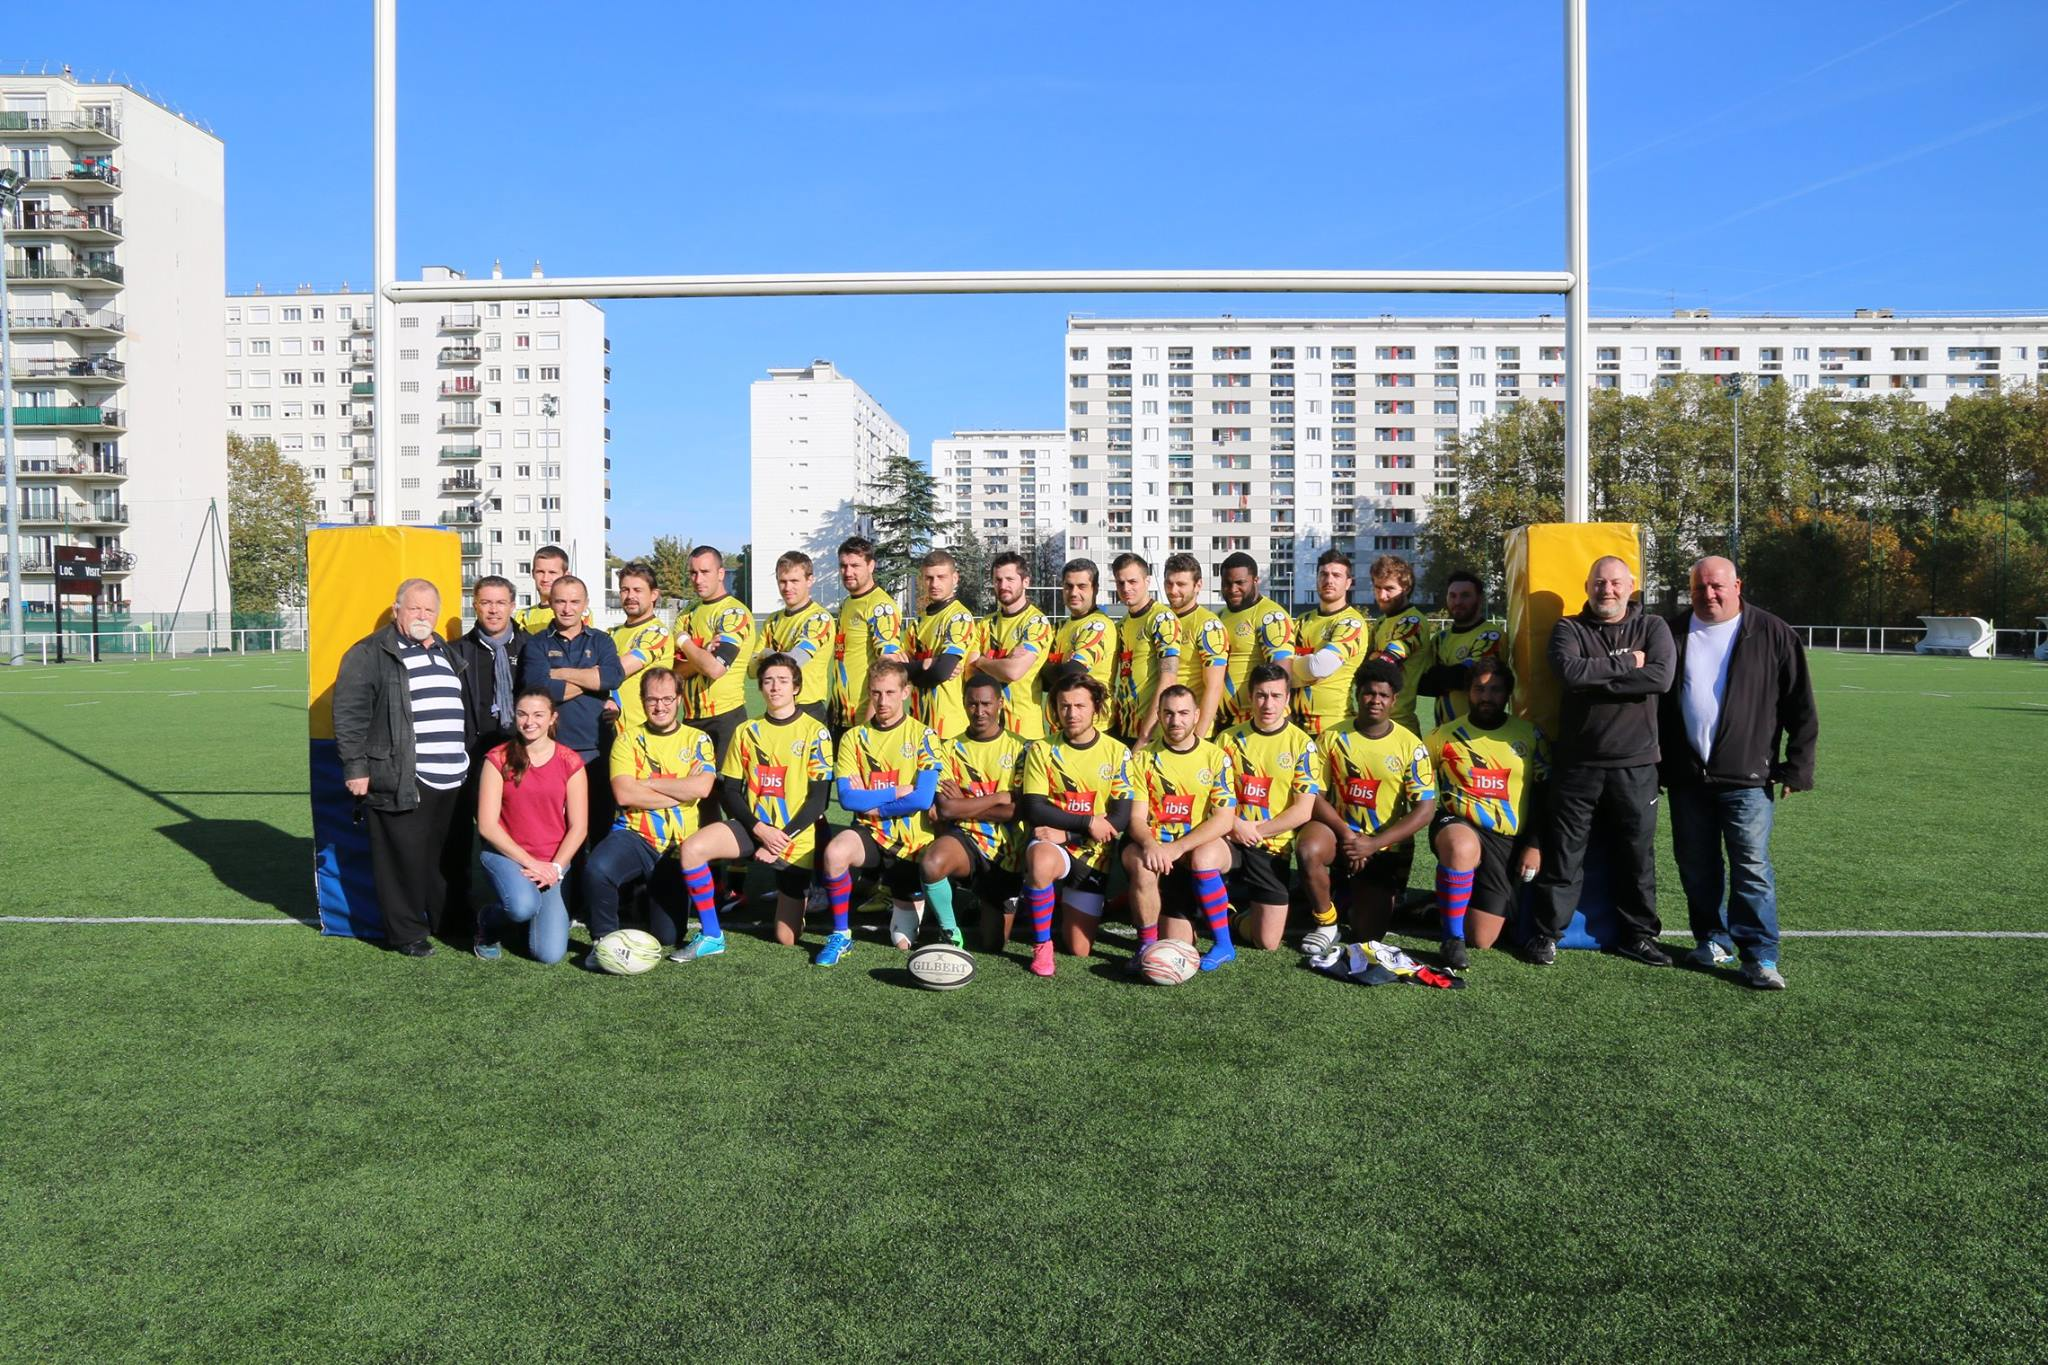 Equipe Seniors de Plessis-Meudon saison 2016/17